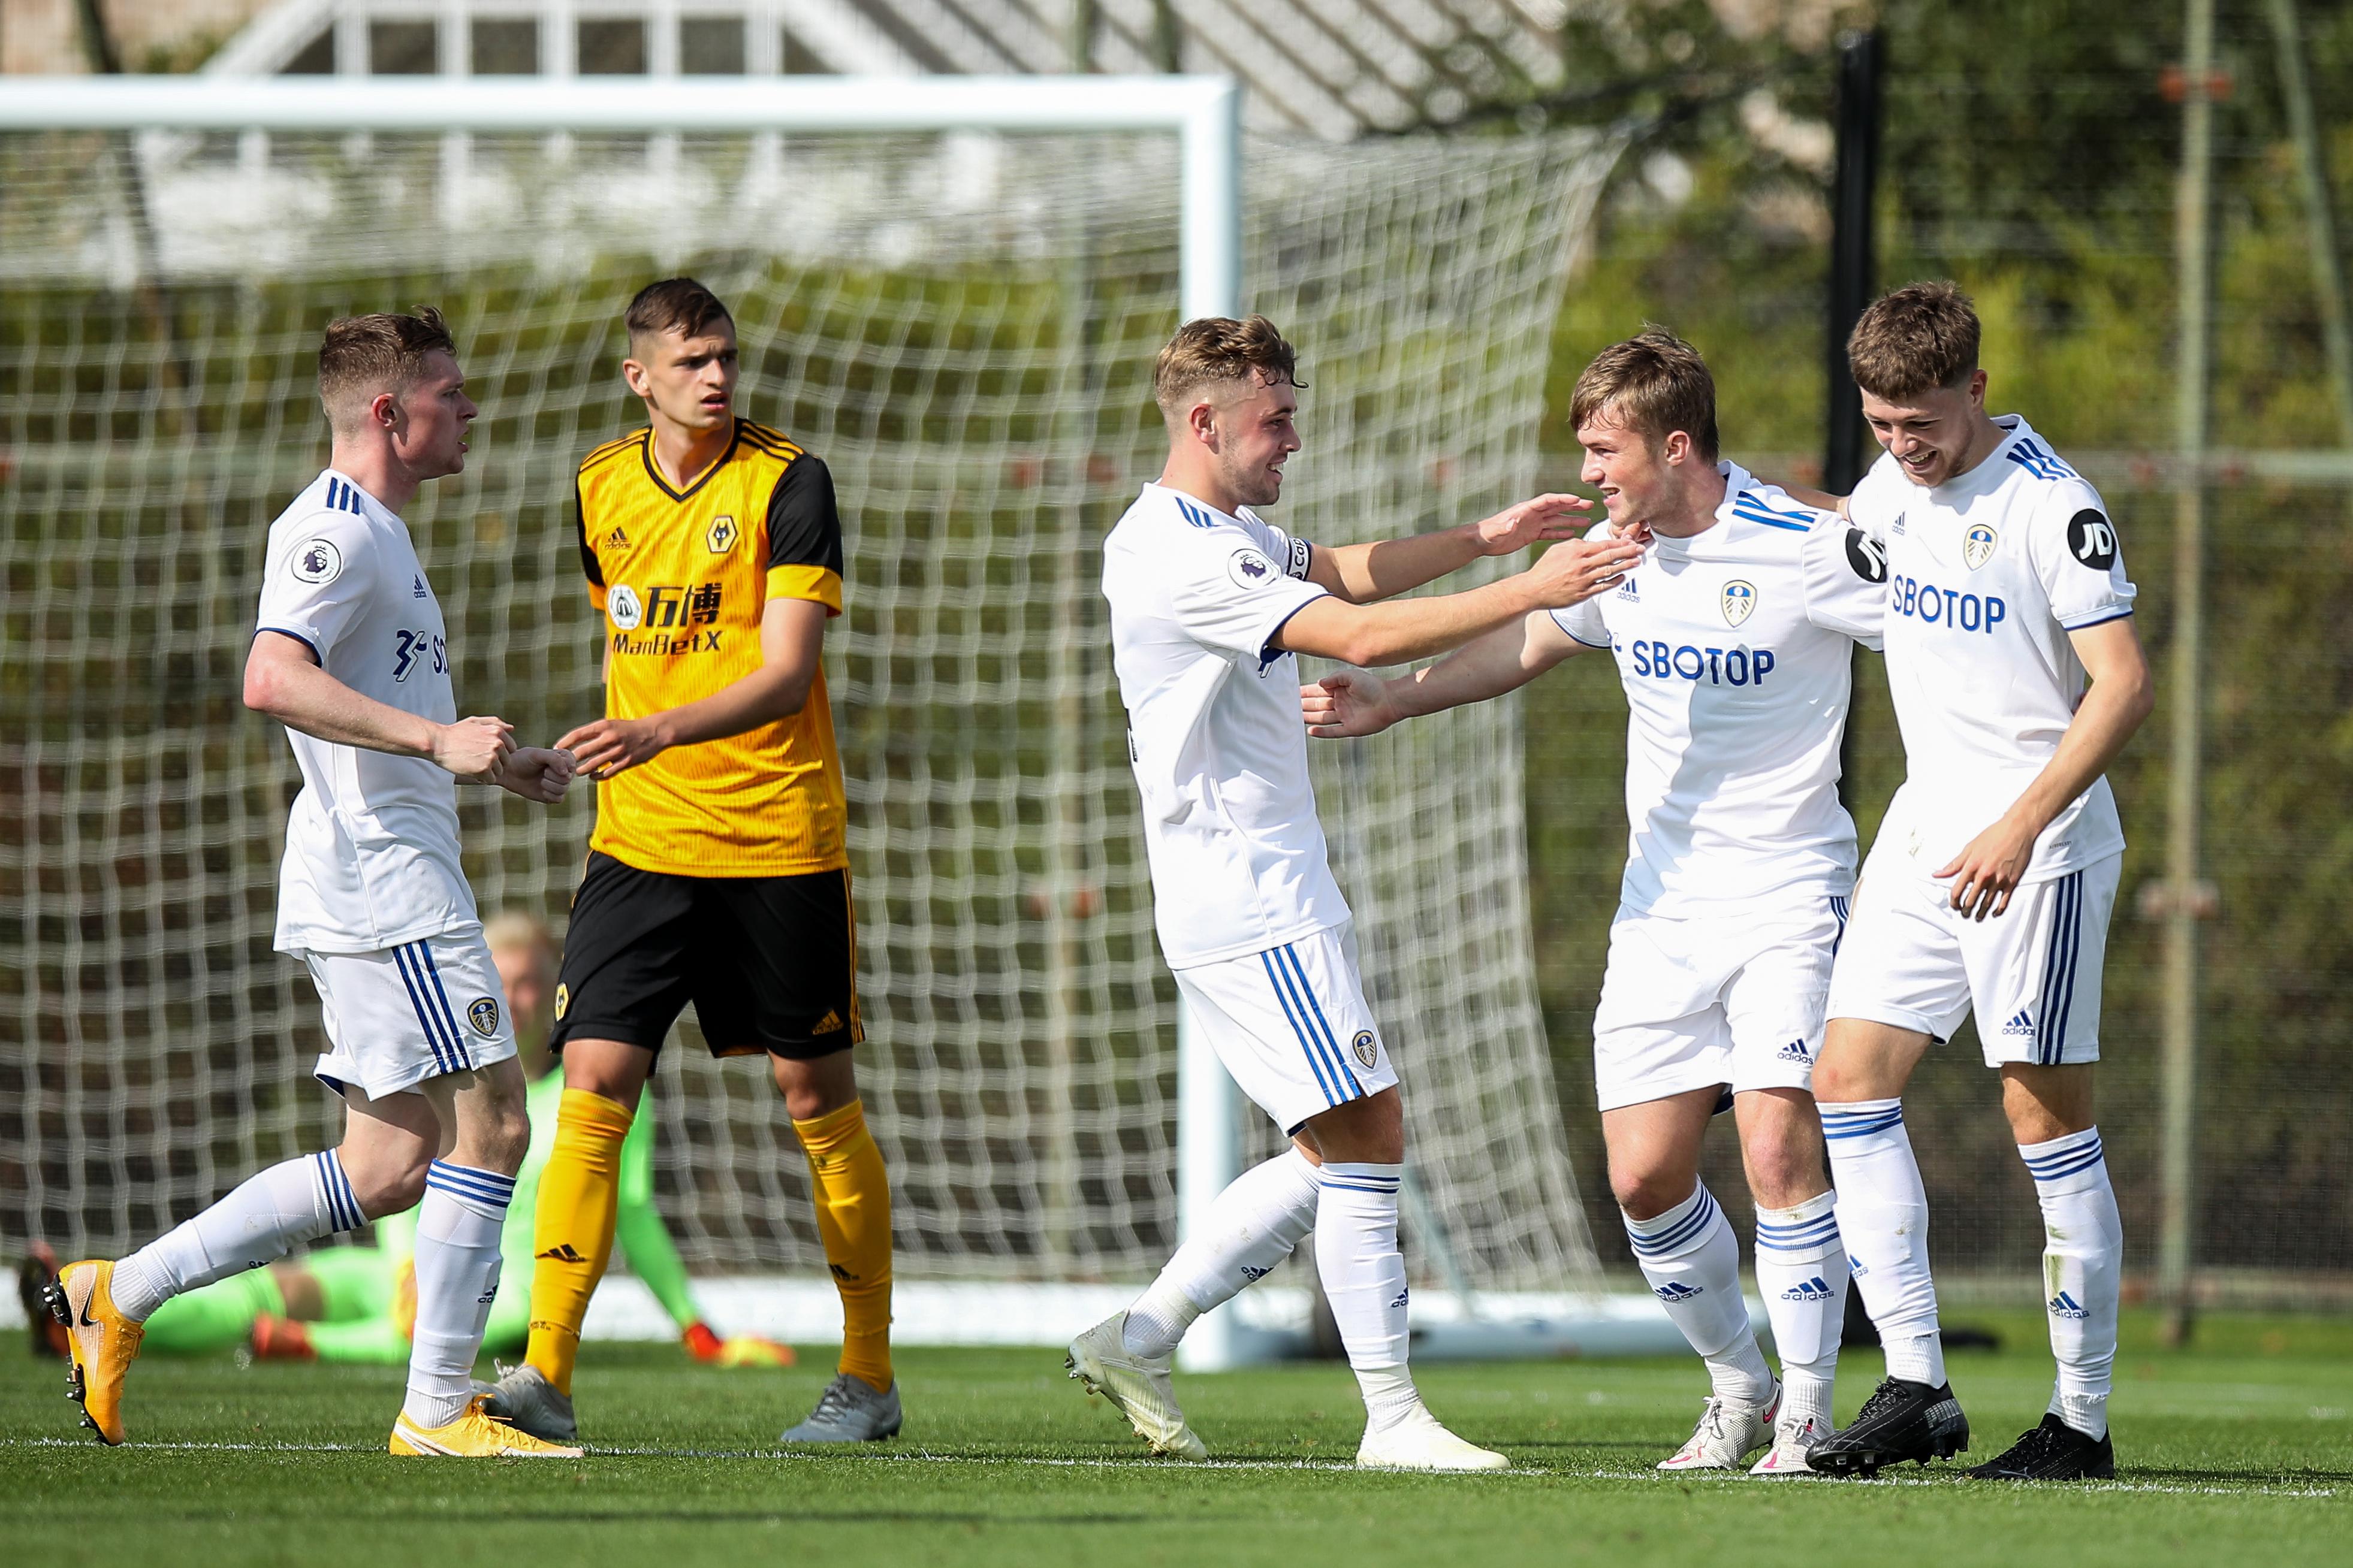 Leeds United U23 v Wolverhampton Wanderers U23 - Under 18s Premier League